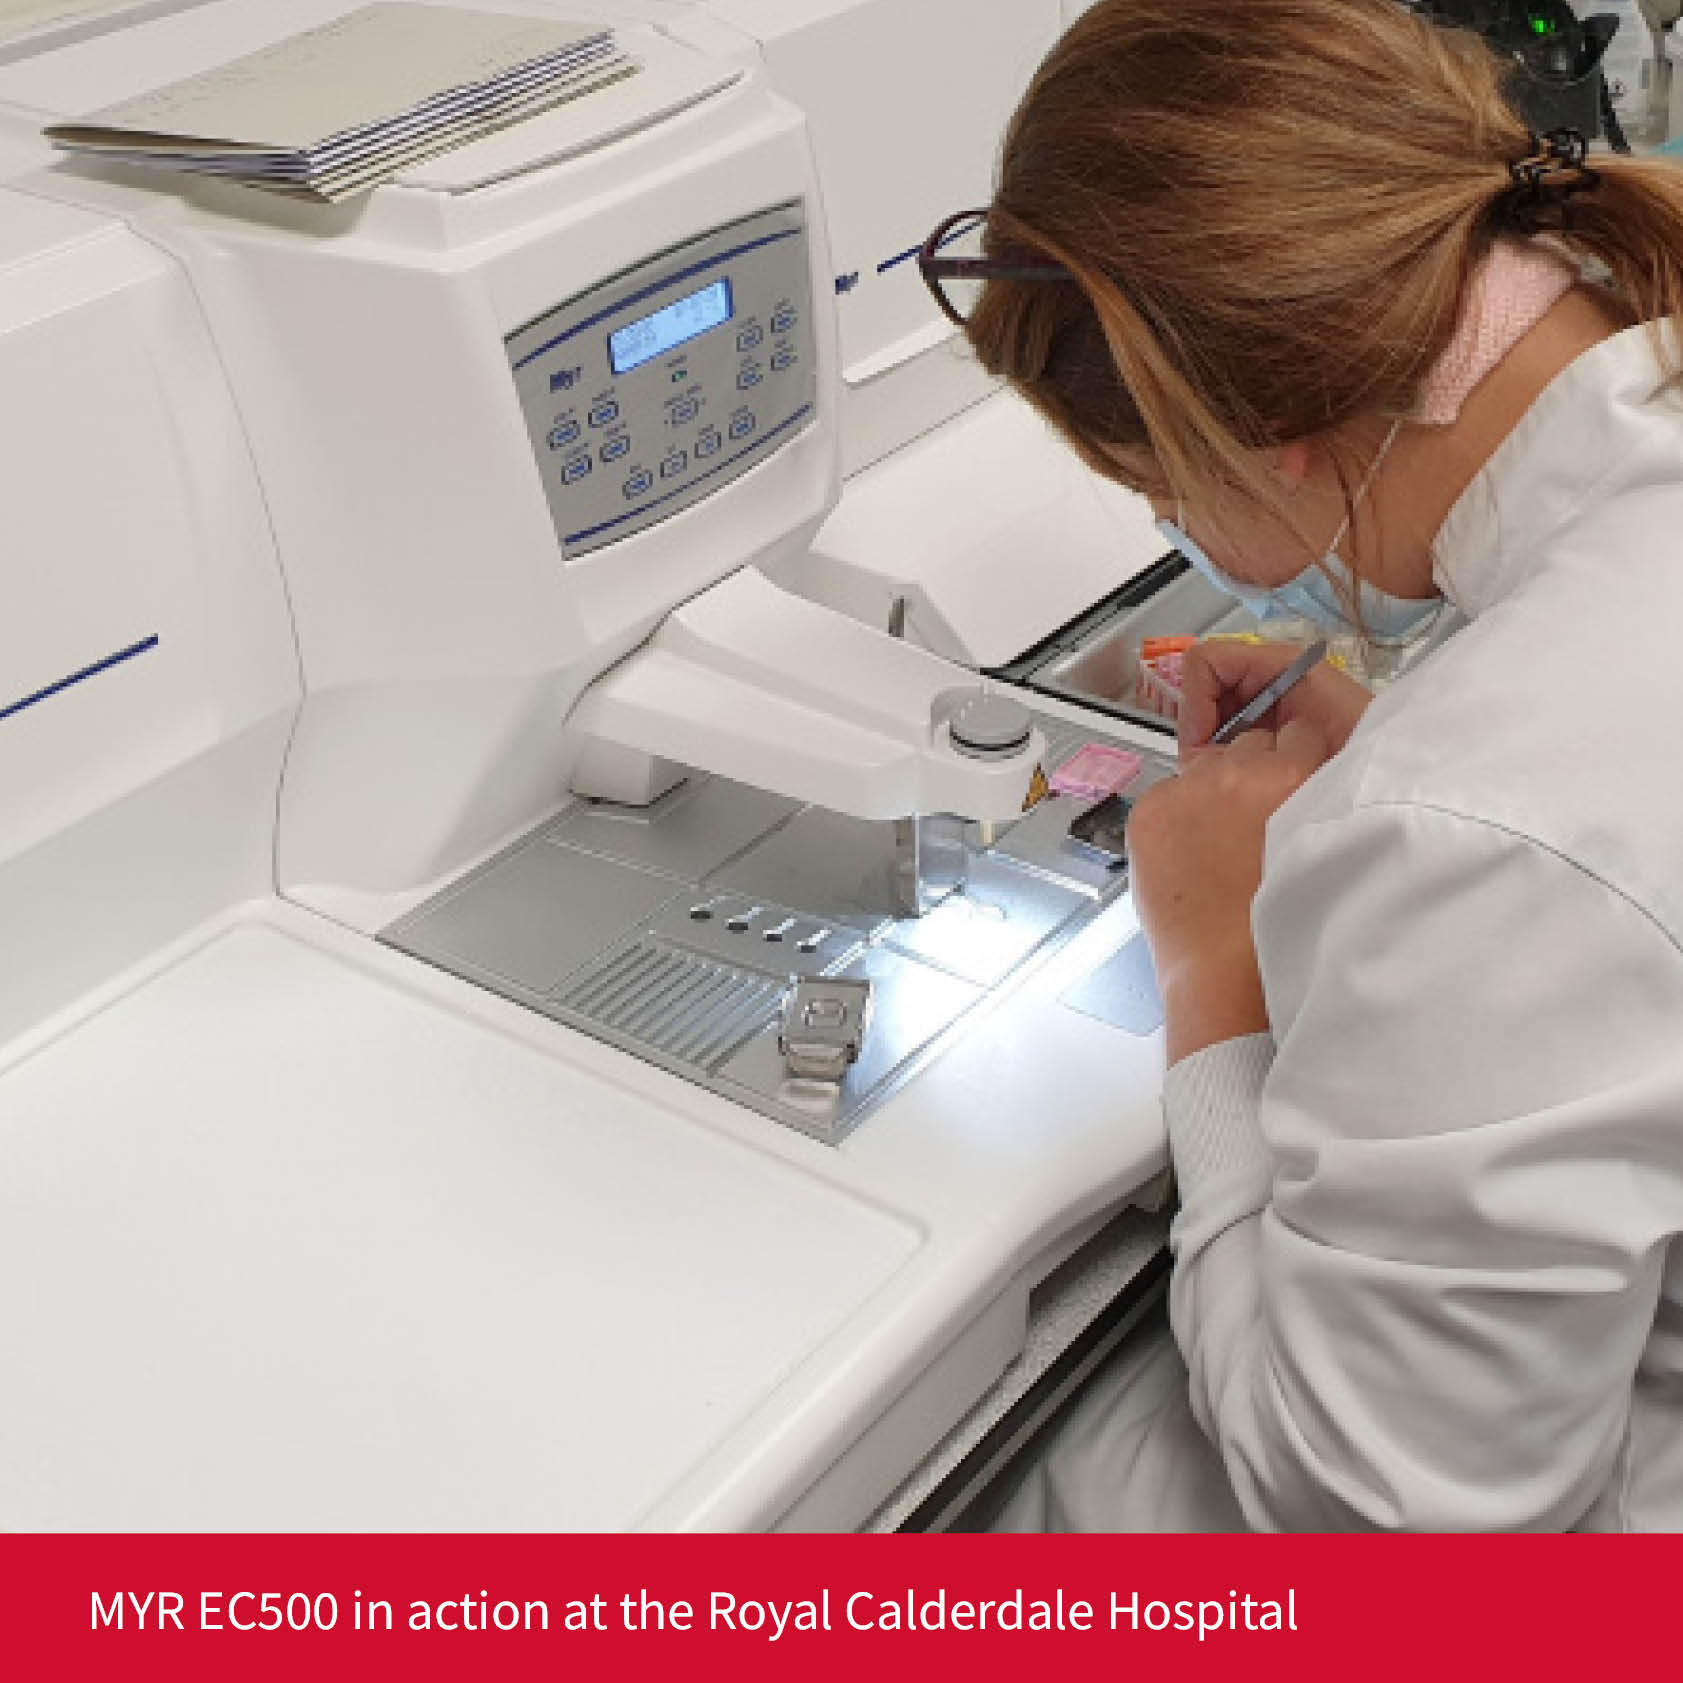 EC500 in action at the Royal Calderdale Hospital